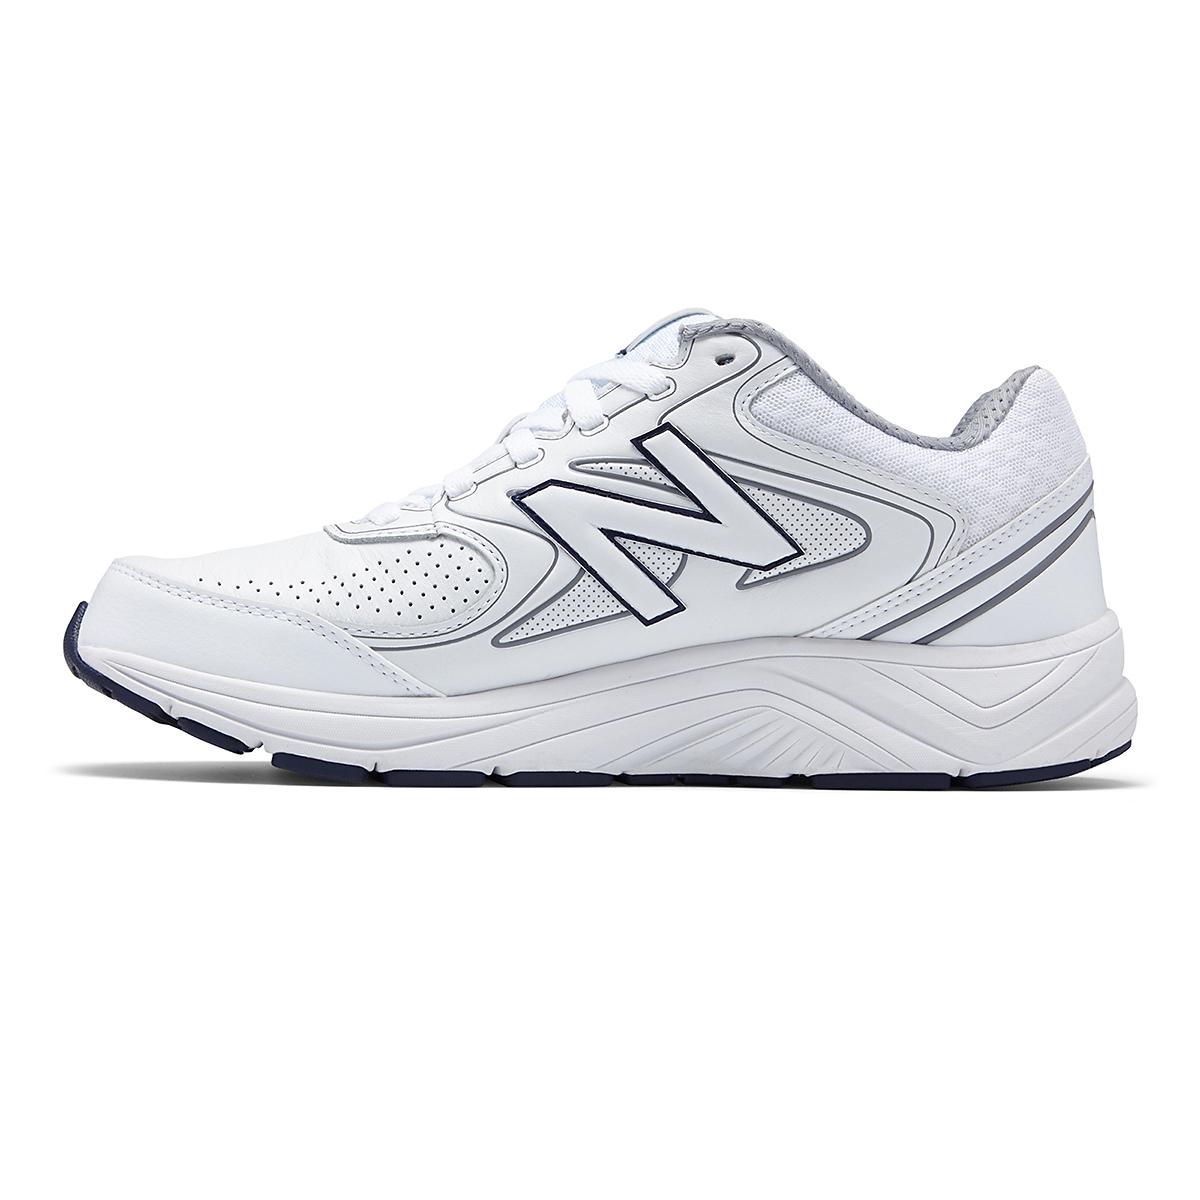 Men's New Balance 840v2 Leather Walking Shoe - Color: White/Navy - Size: 7 - Width: Wide, White/Navy, large, image 2